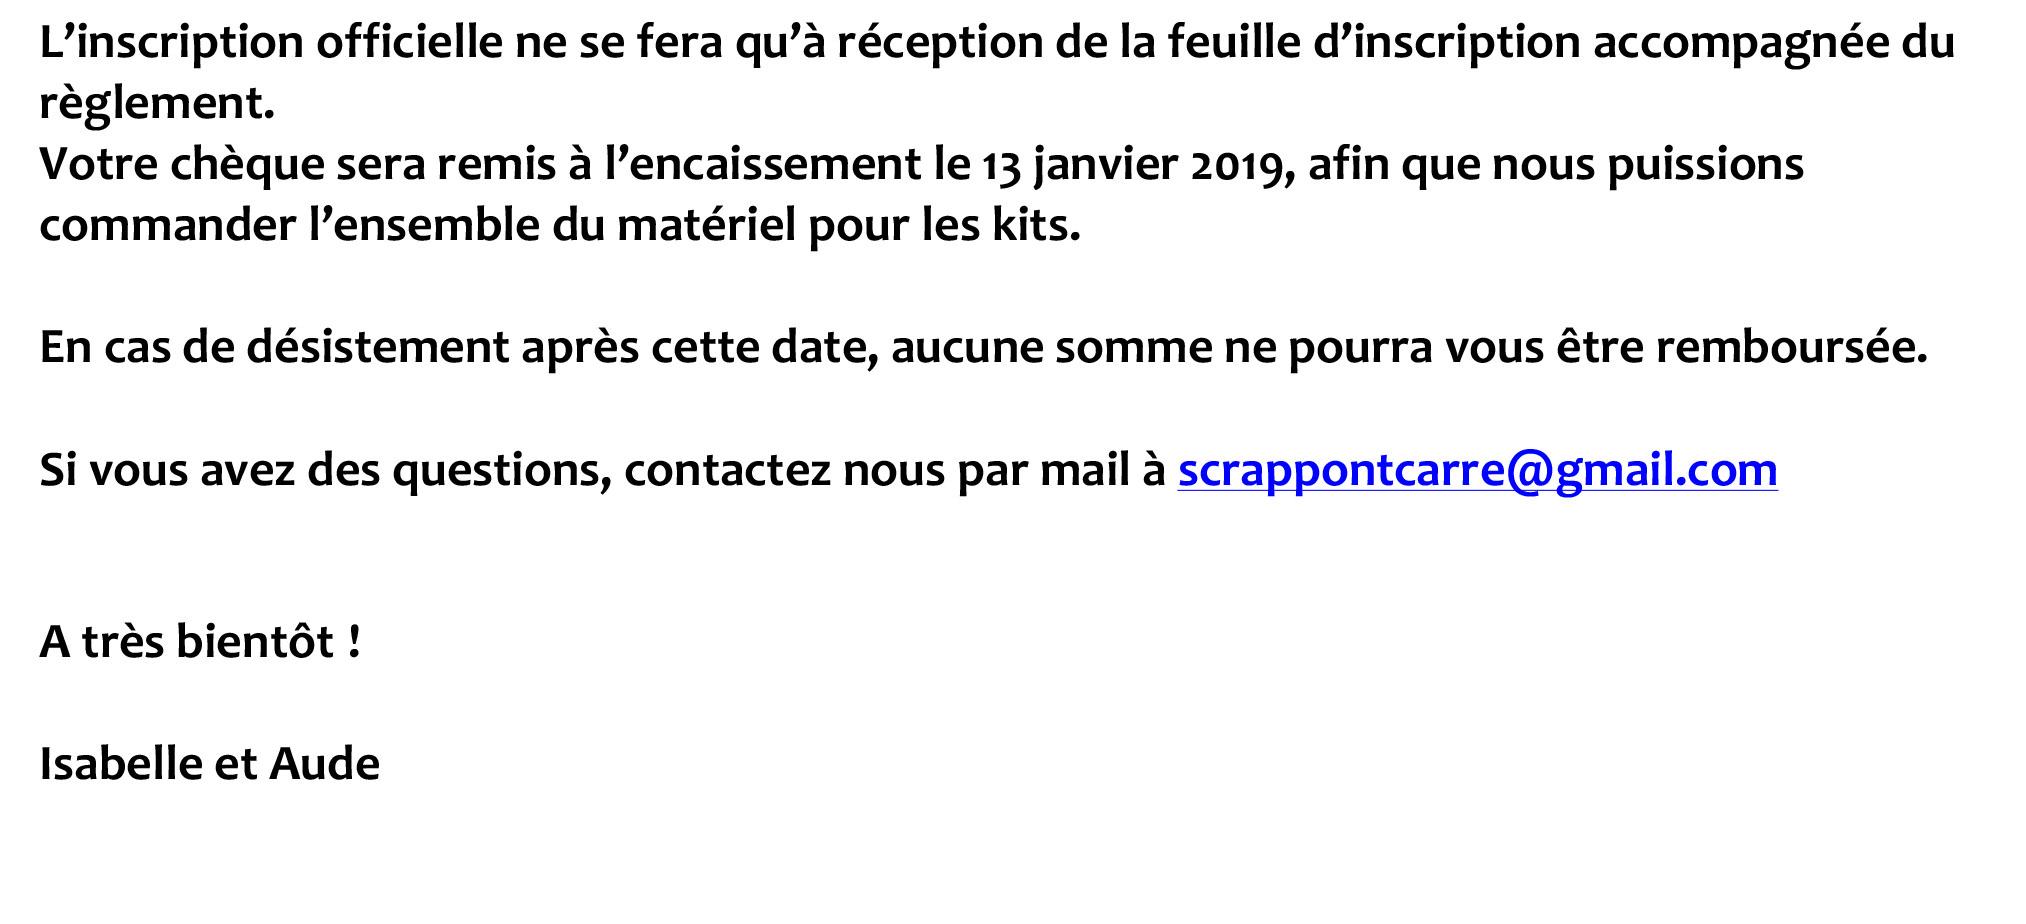 Microsoft Word – Bulletin d'inscription crop février 2019 SCRAP